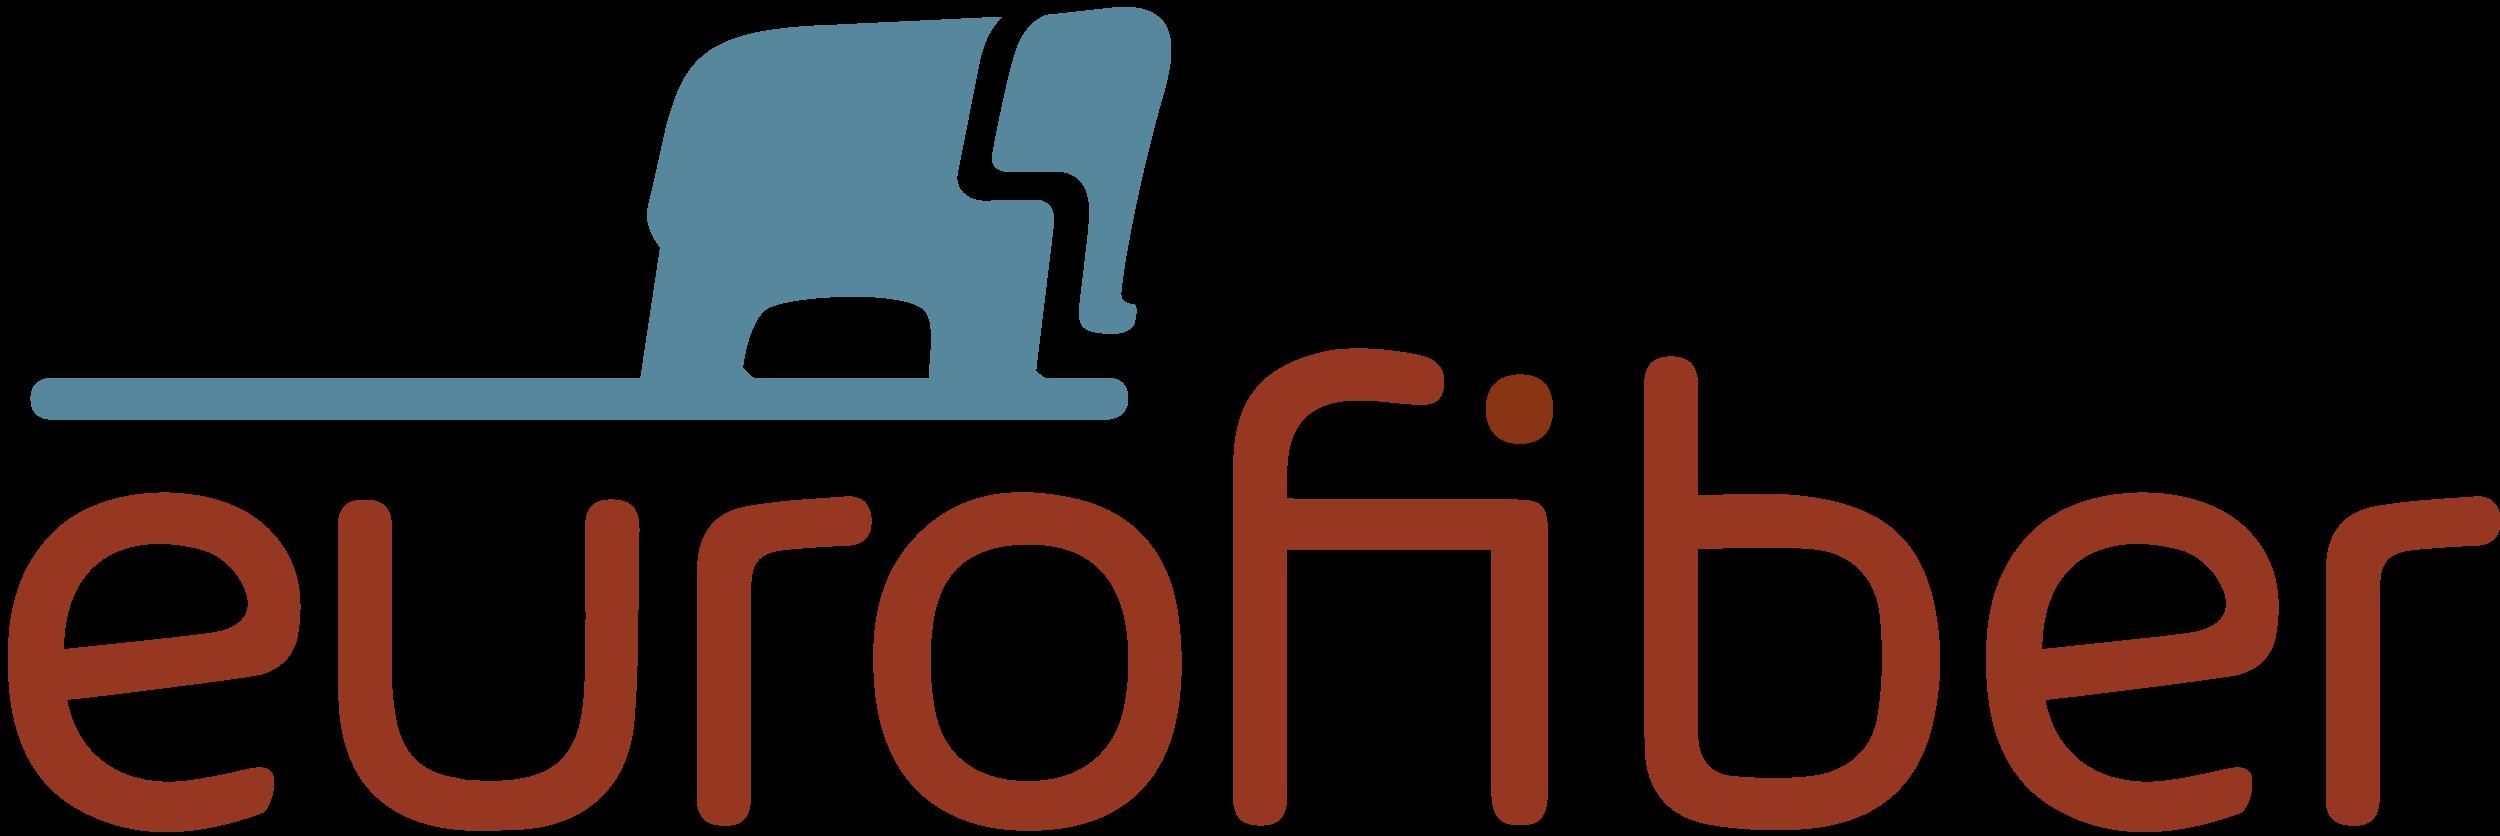 logo-eurofiber